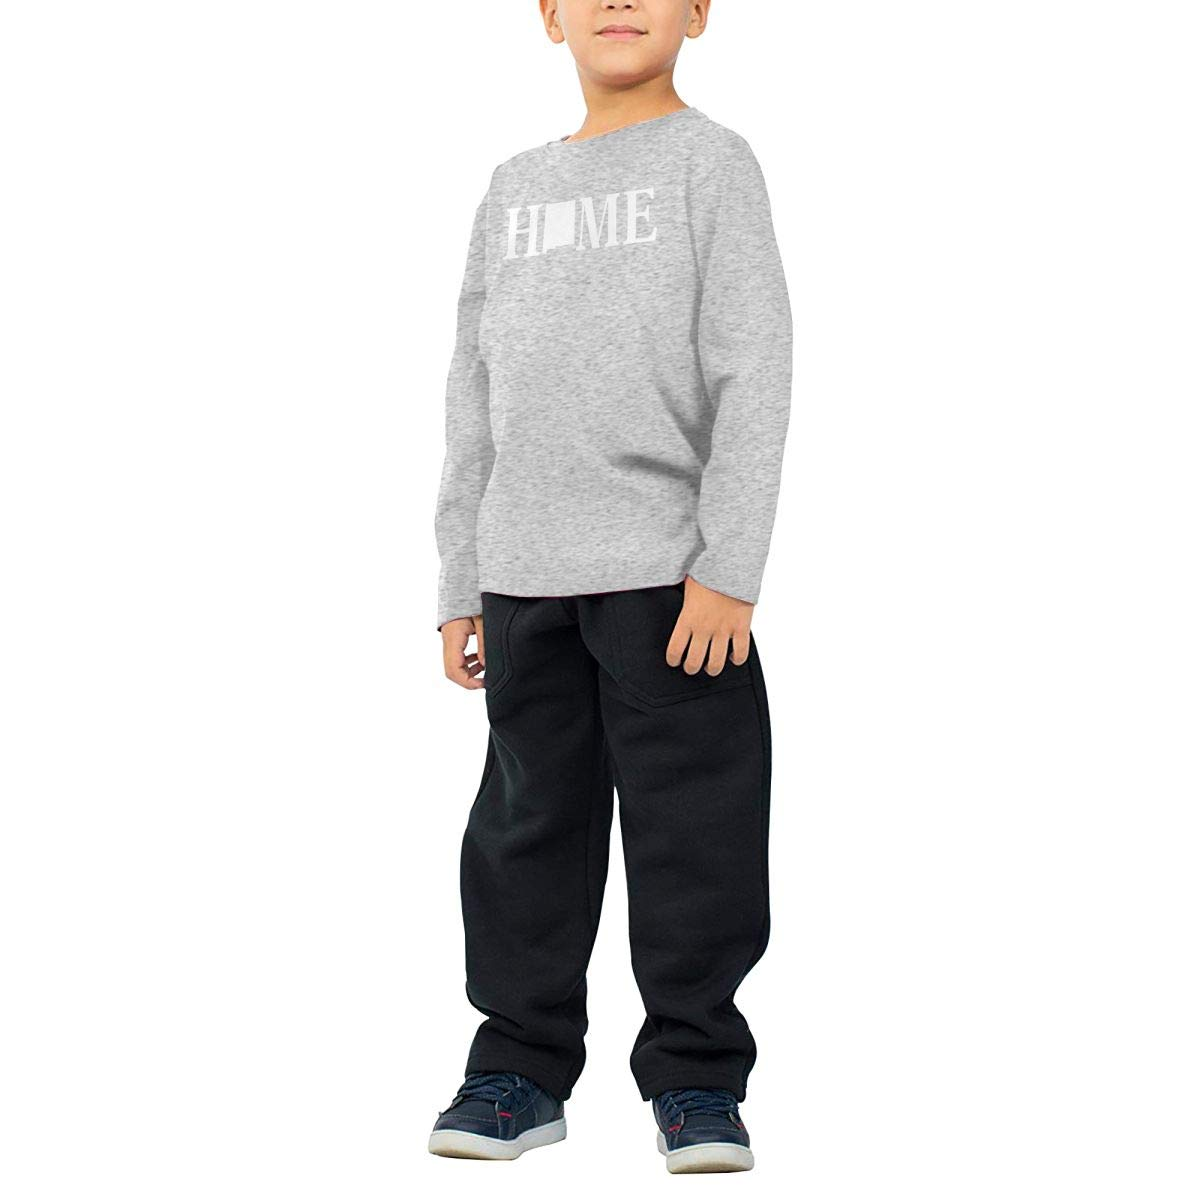 HADYKIDSLOVE New Mexico State Home Kids T-Shirt Long Sleeve Boys Girls T-Shirt